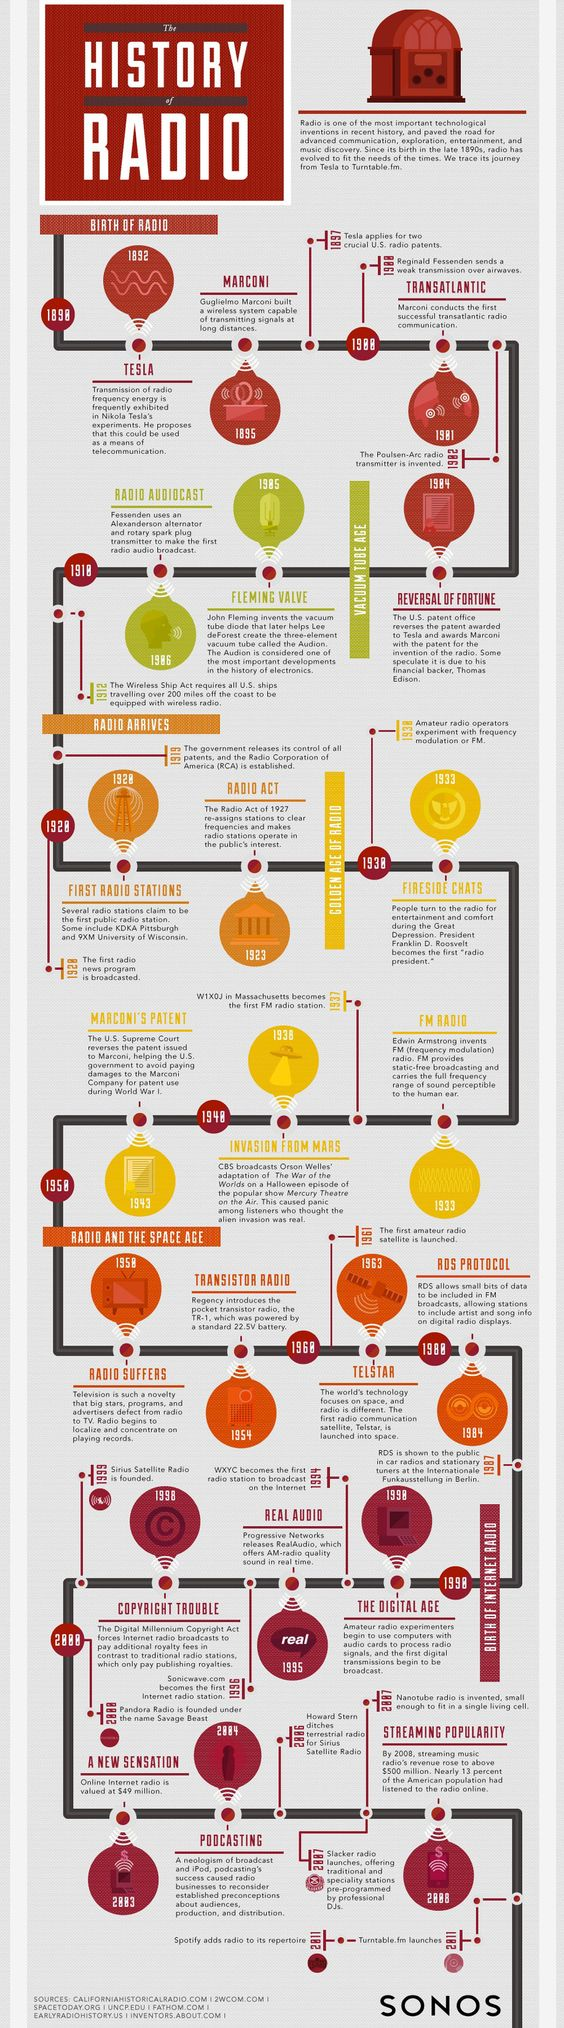 The History of Radio.